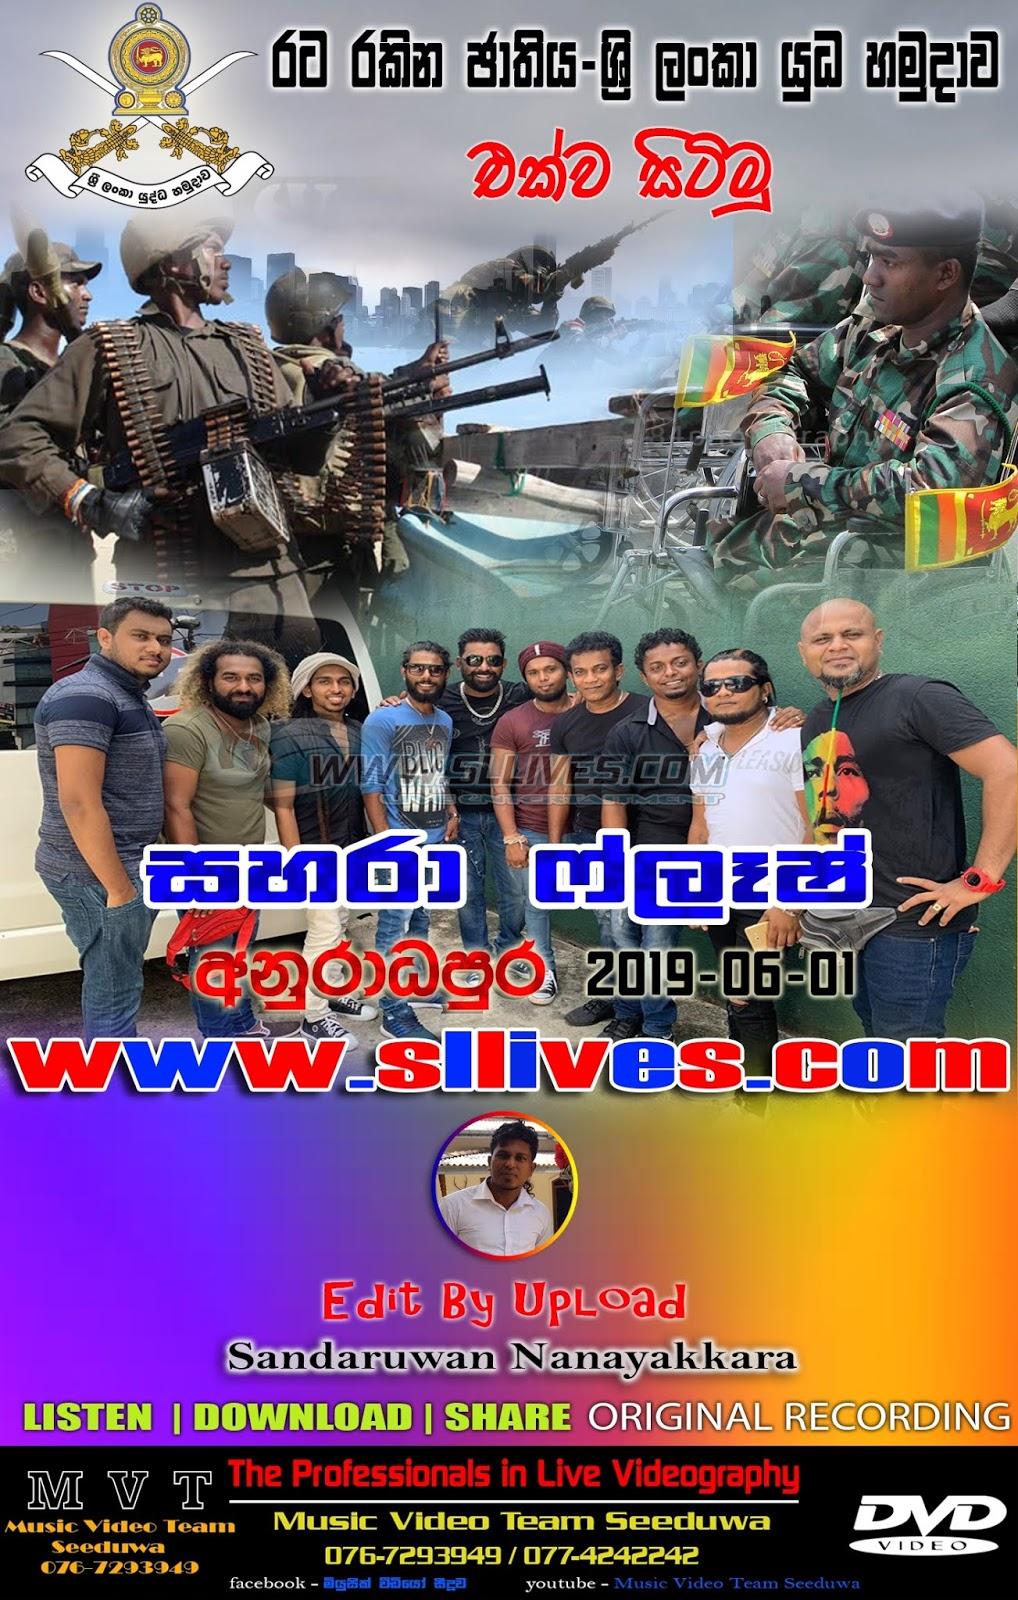 sahara live show mp3 free download